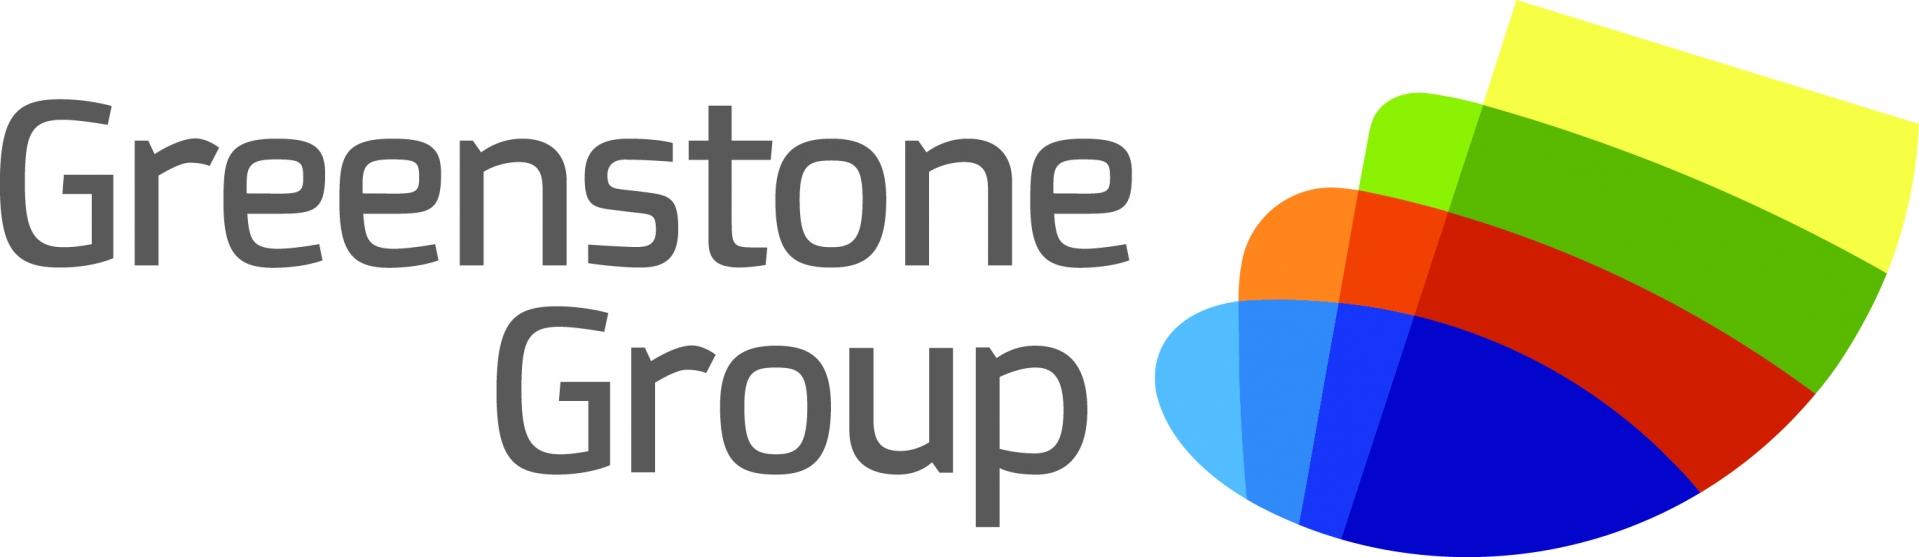 Greenstone Group.jpeg